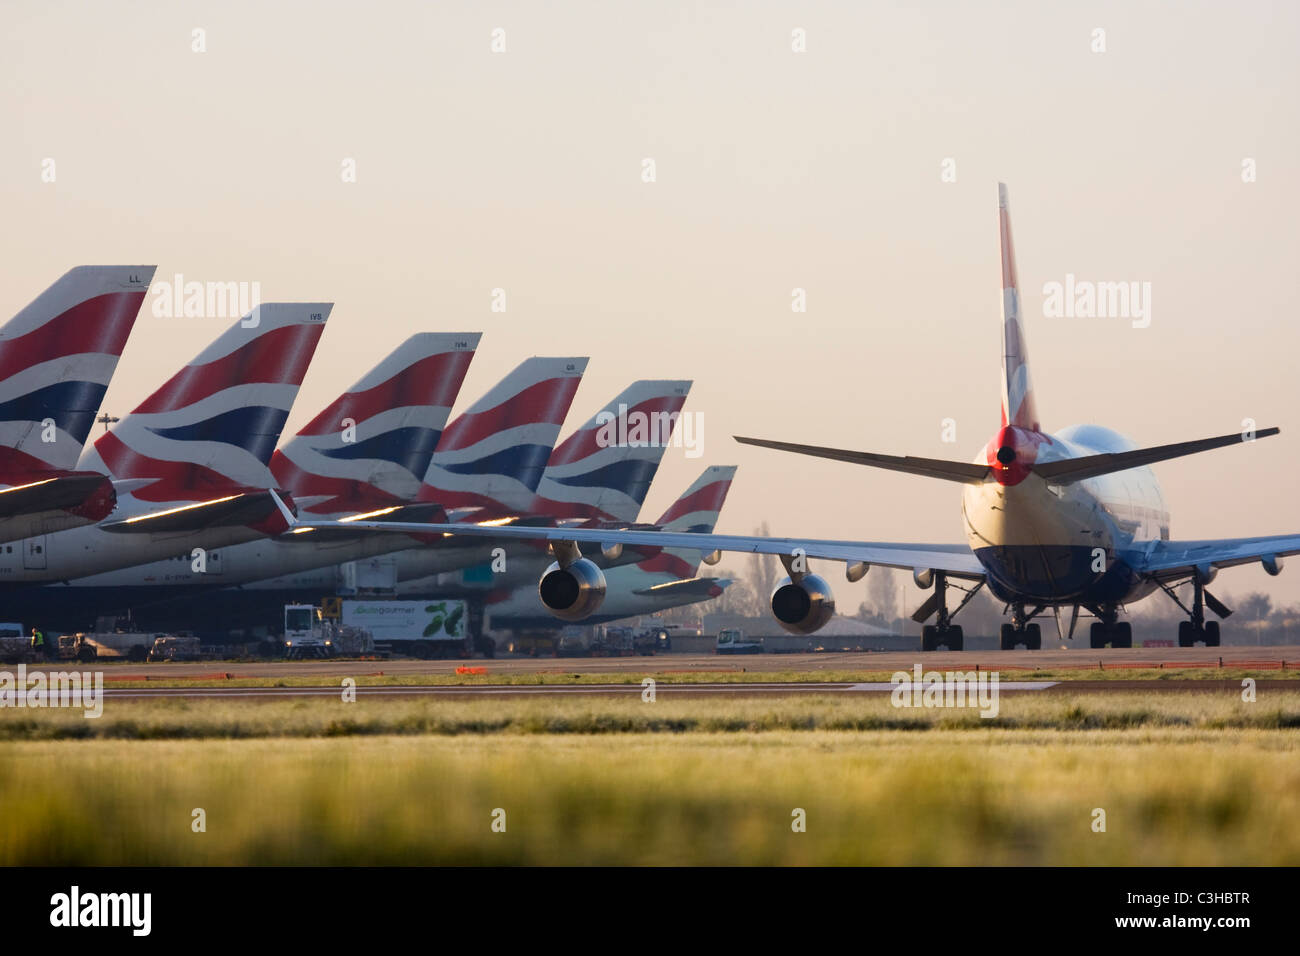 Fleet of British Airways airliners at London Heathrow Airport UK Stock Photo